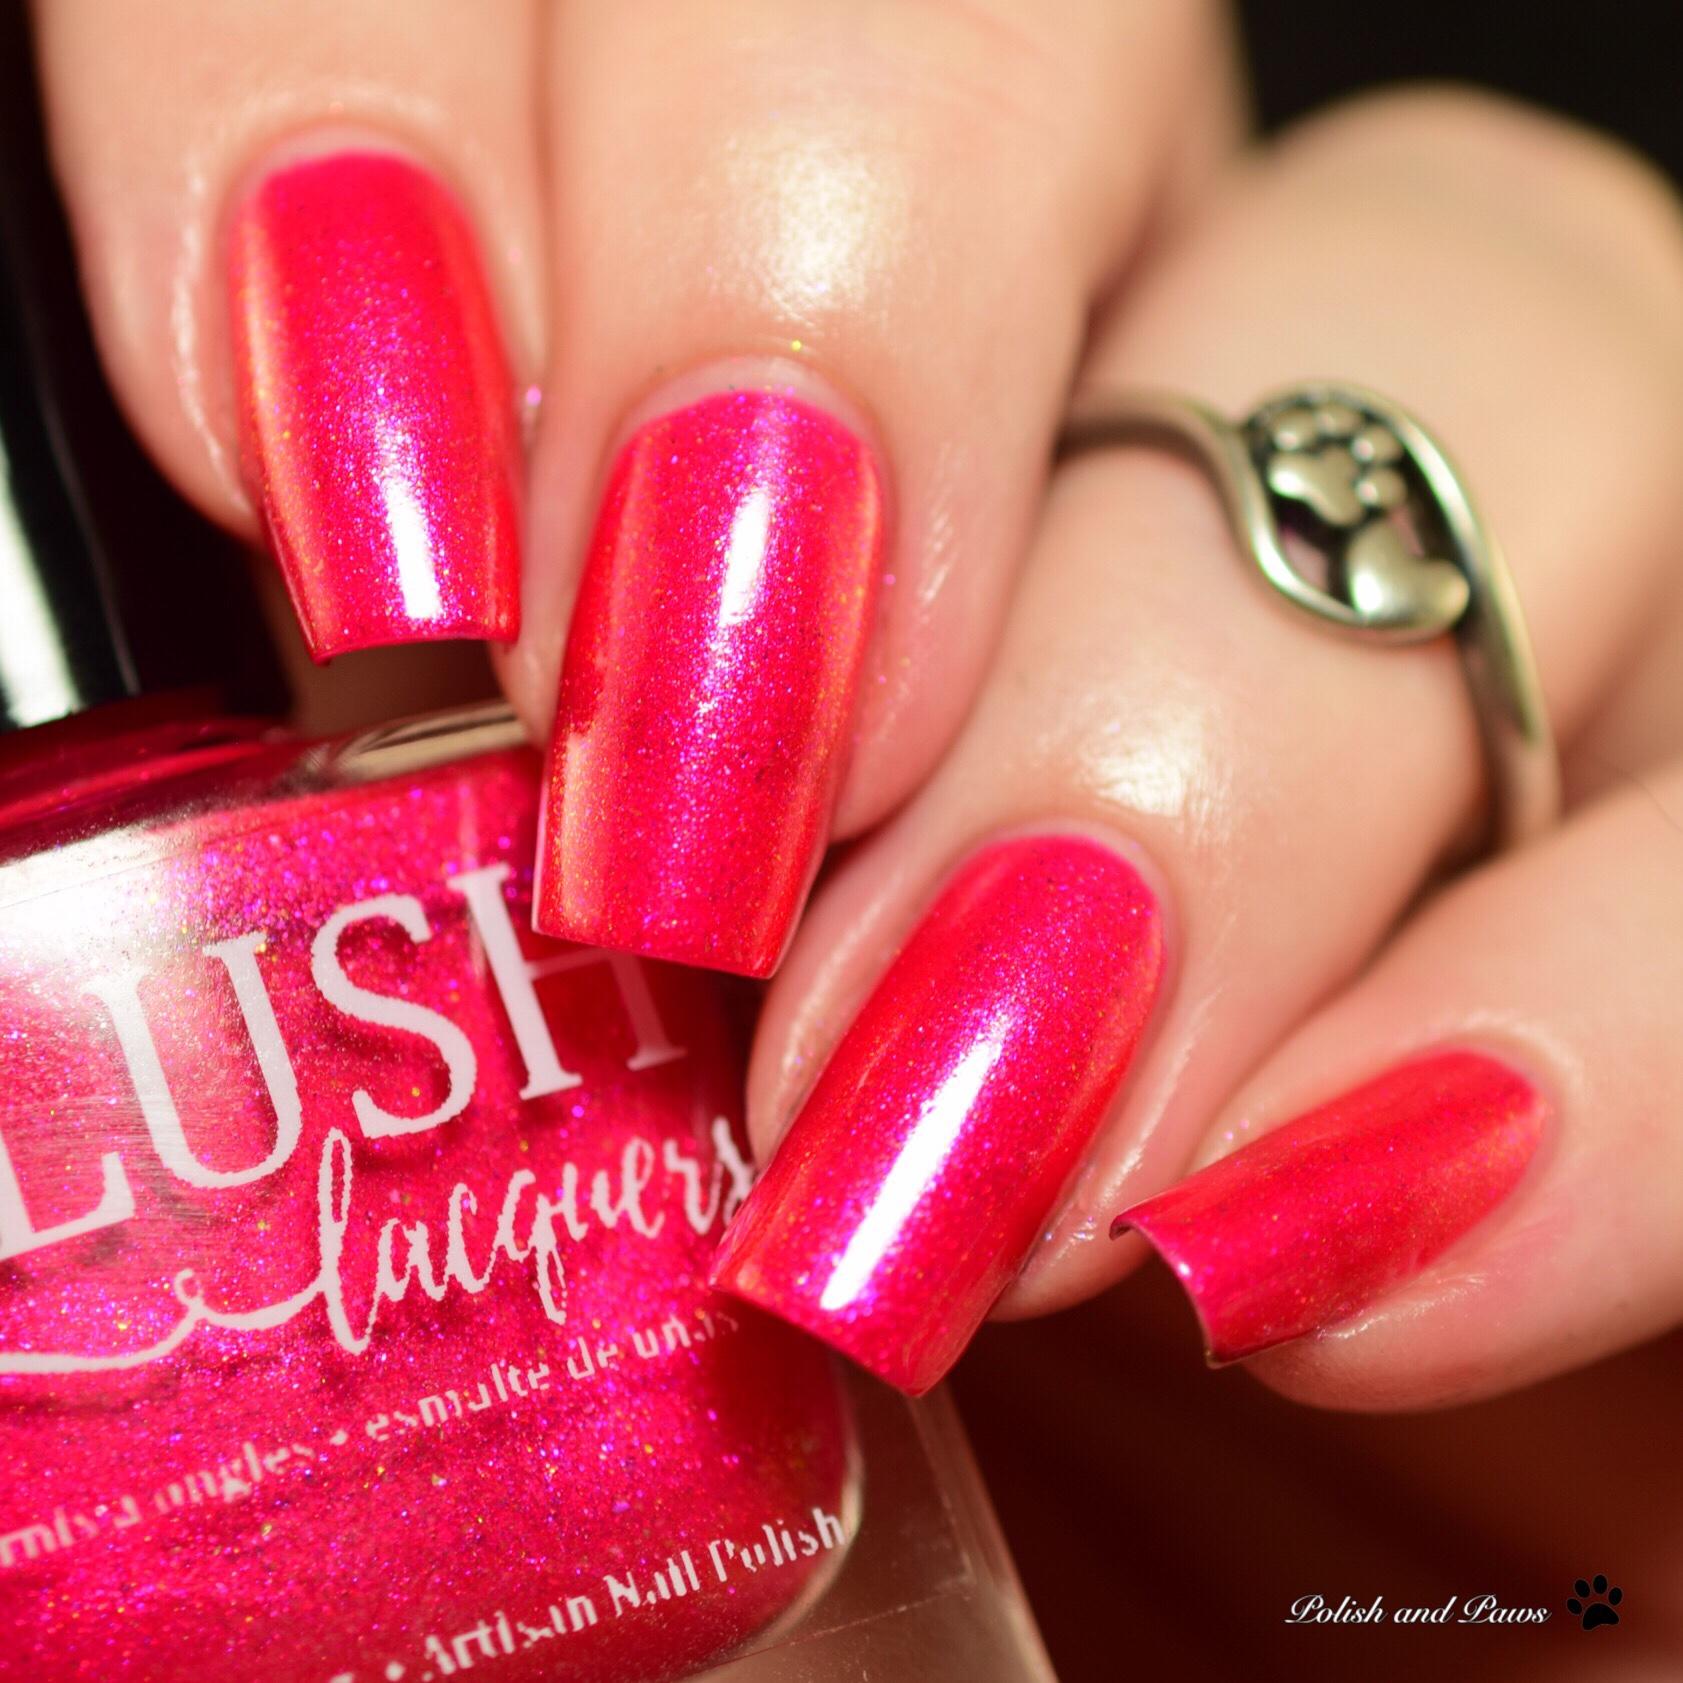 Blush Lacquers Lipstick Matchsticks